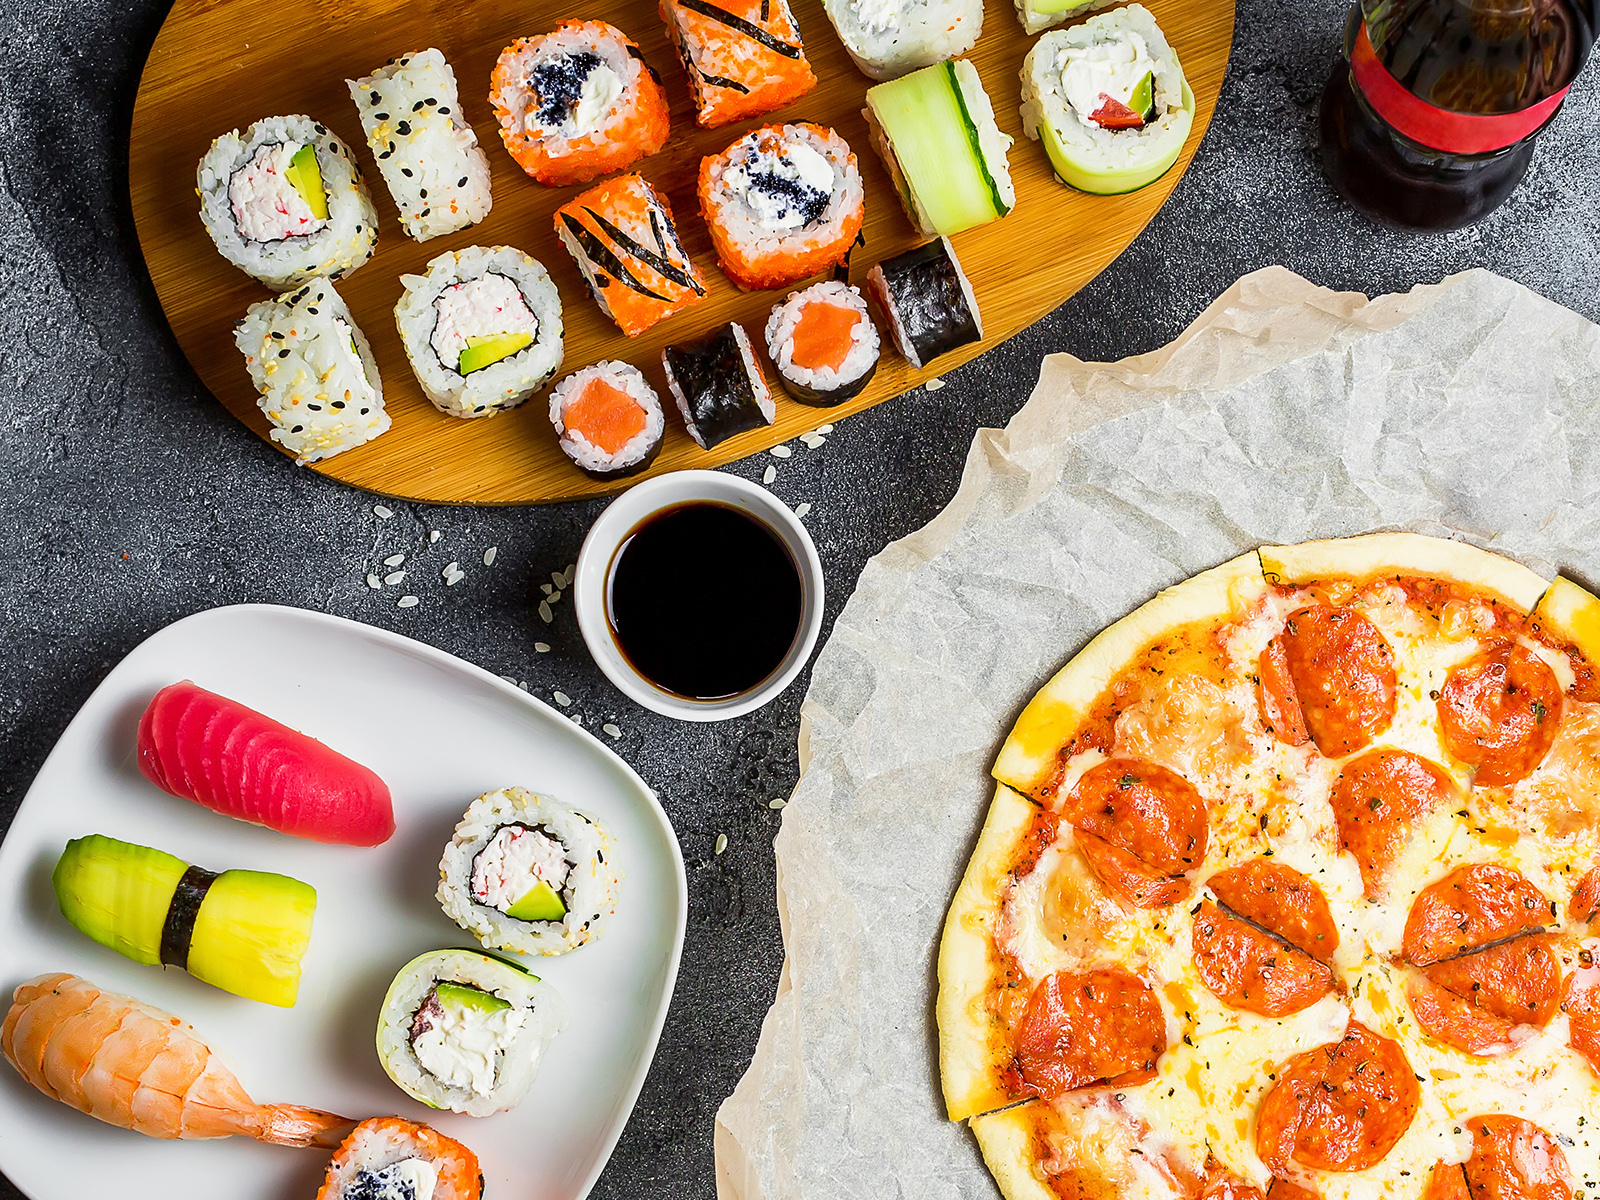 La Pizza & Sushi